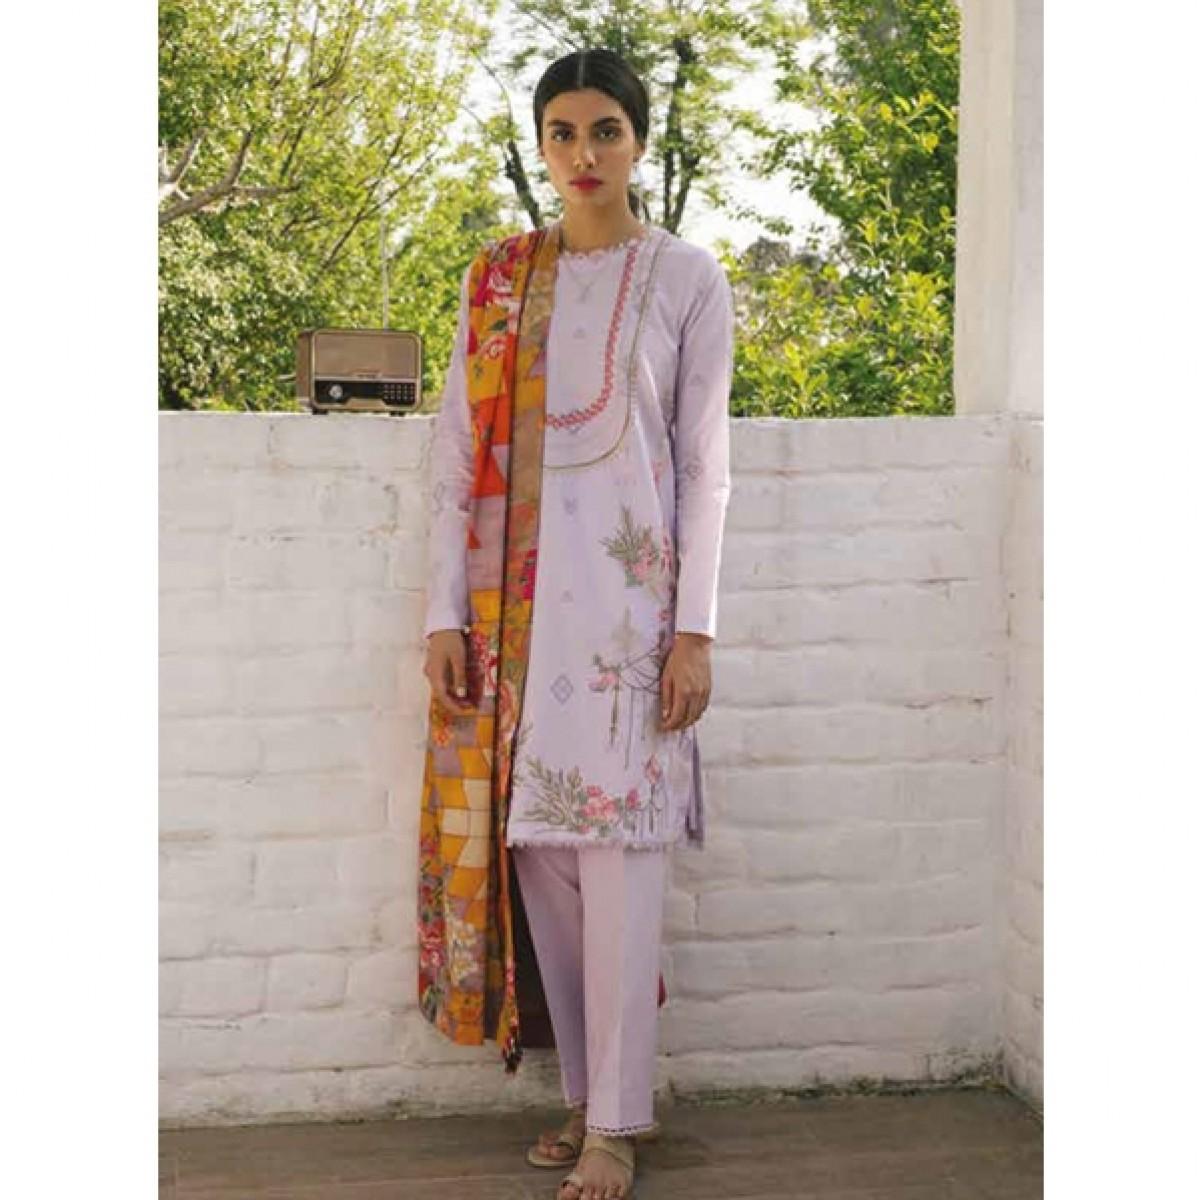 727707bb Zara Shahjahan Coco Spring Lawn 2019 Price in Pakistan | Buy Zara Shahjahan  Summer Lawn Collection 2019 3 Piece (05B) | iShopping.pk